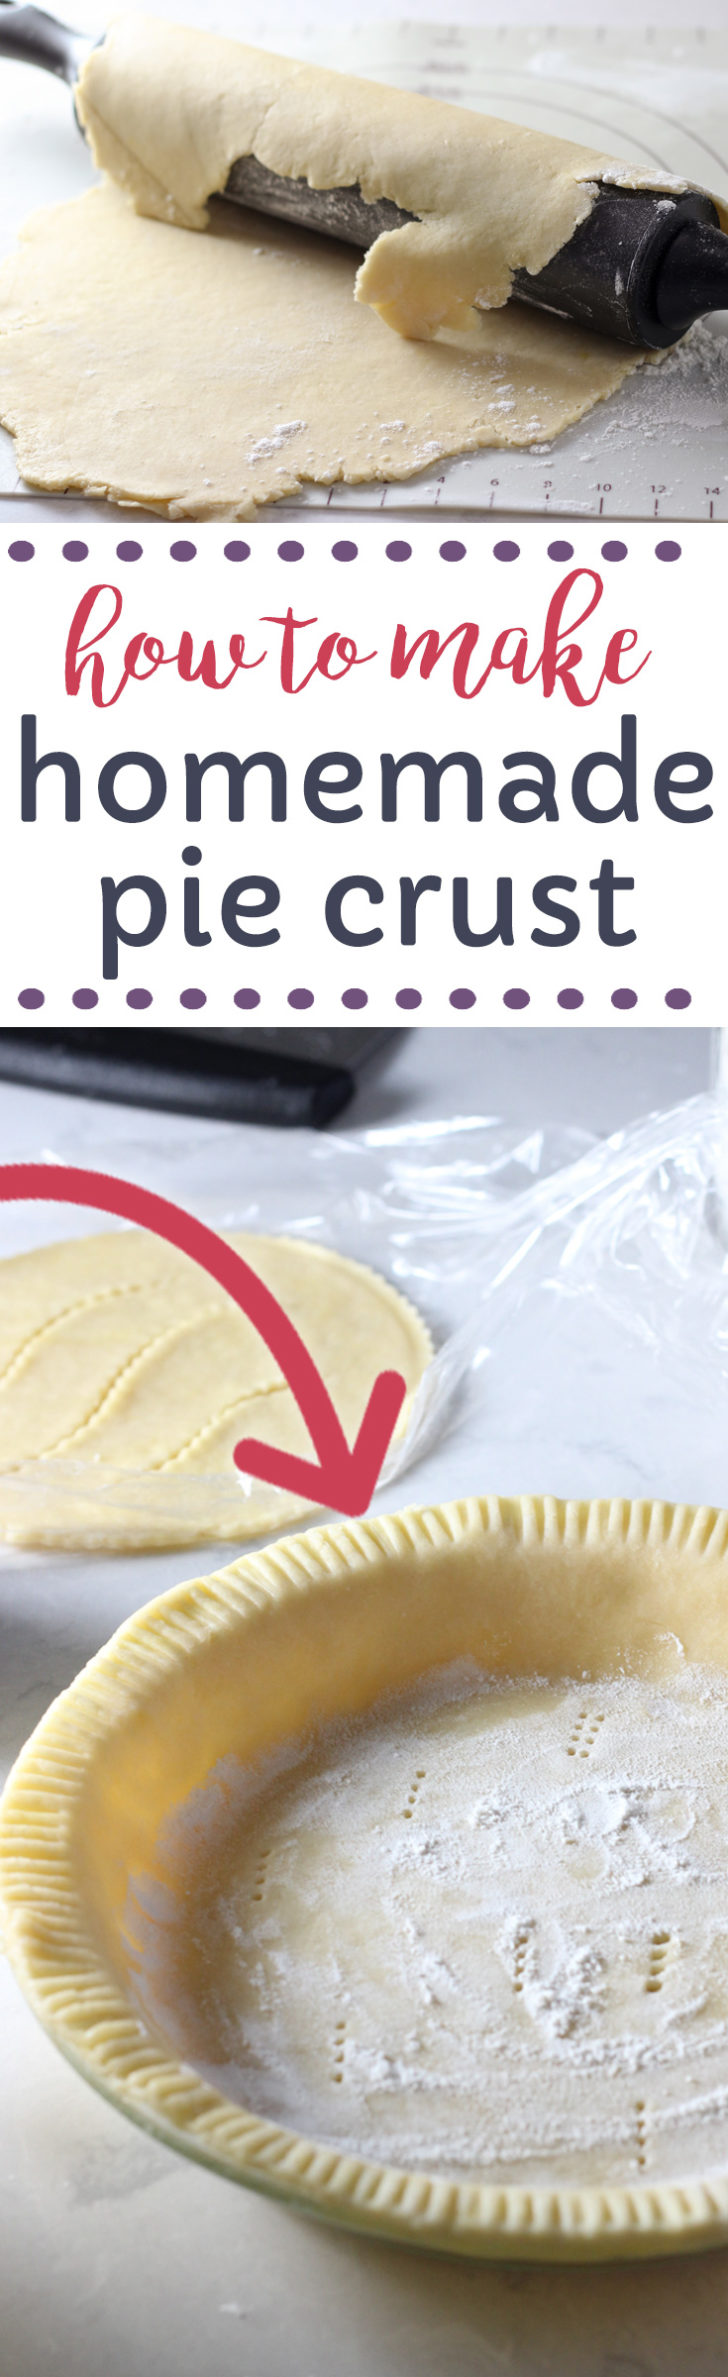 Homemade pie crust recipe made with shortening.